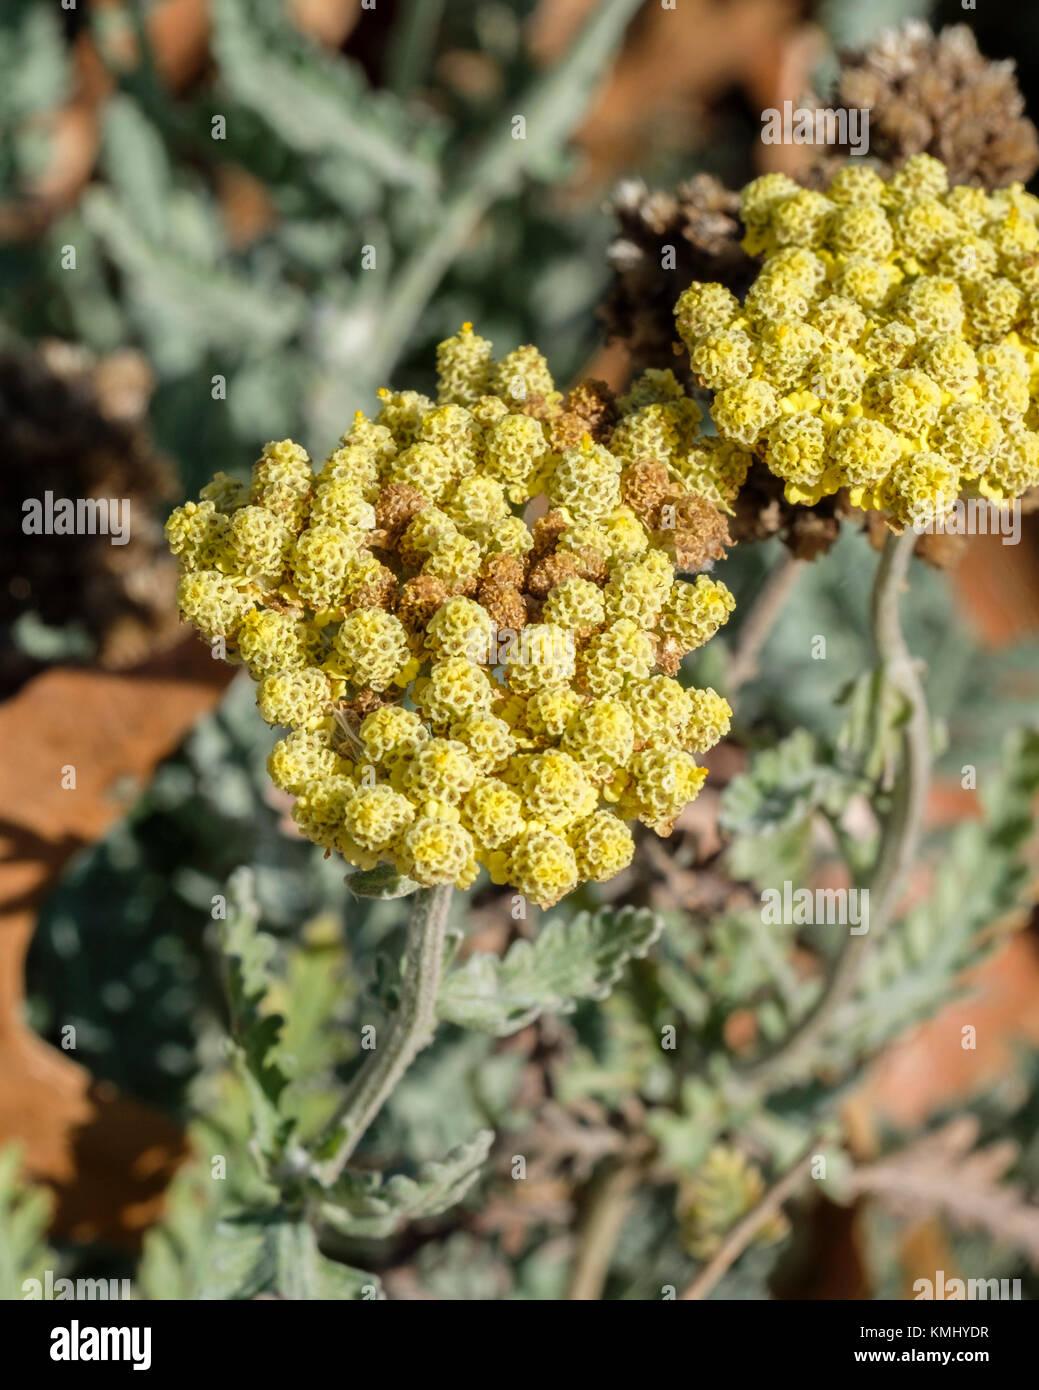 Sweet Yarrow, Achillea filipendulina, fernleaf yarrow,  Asteraceae. Oklahoma City, Oklahoma, USA. - Stock Image